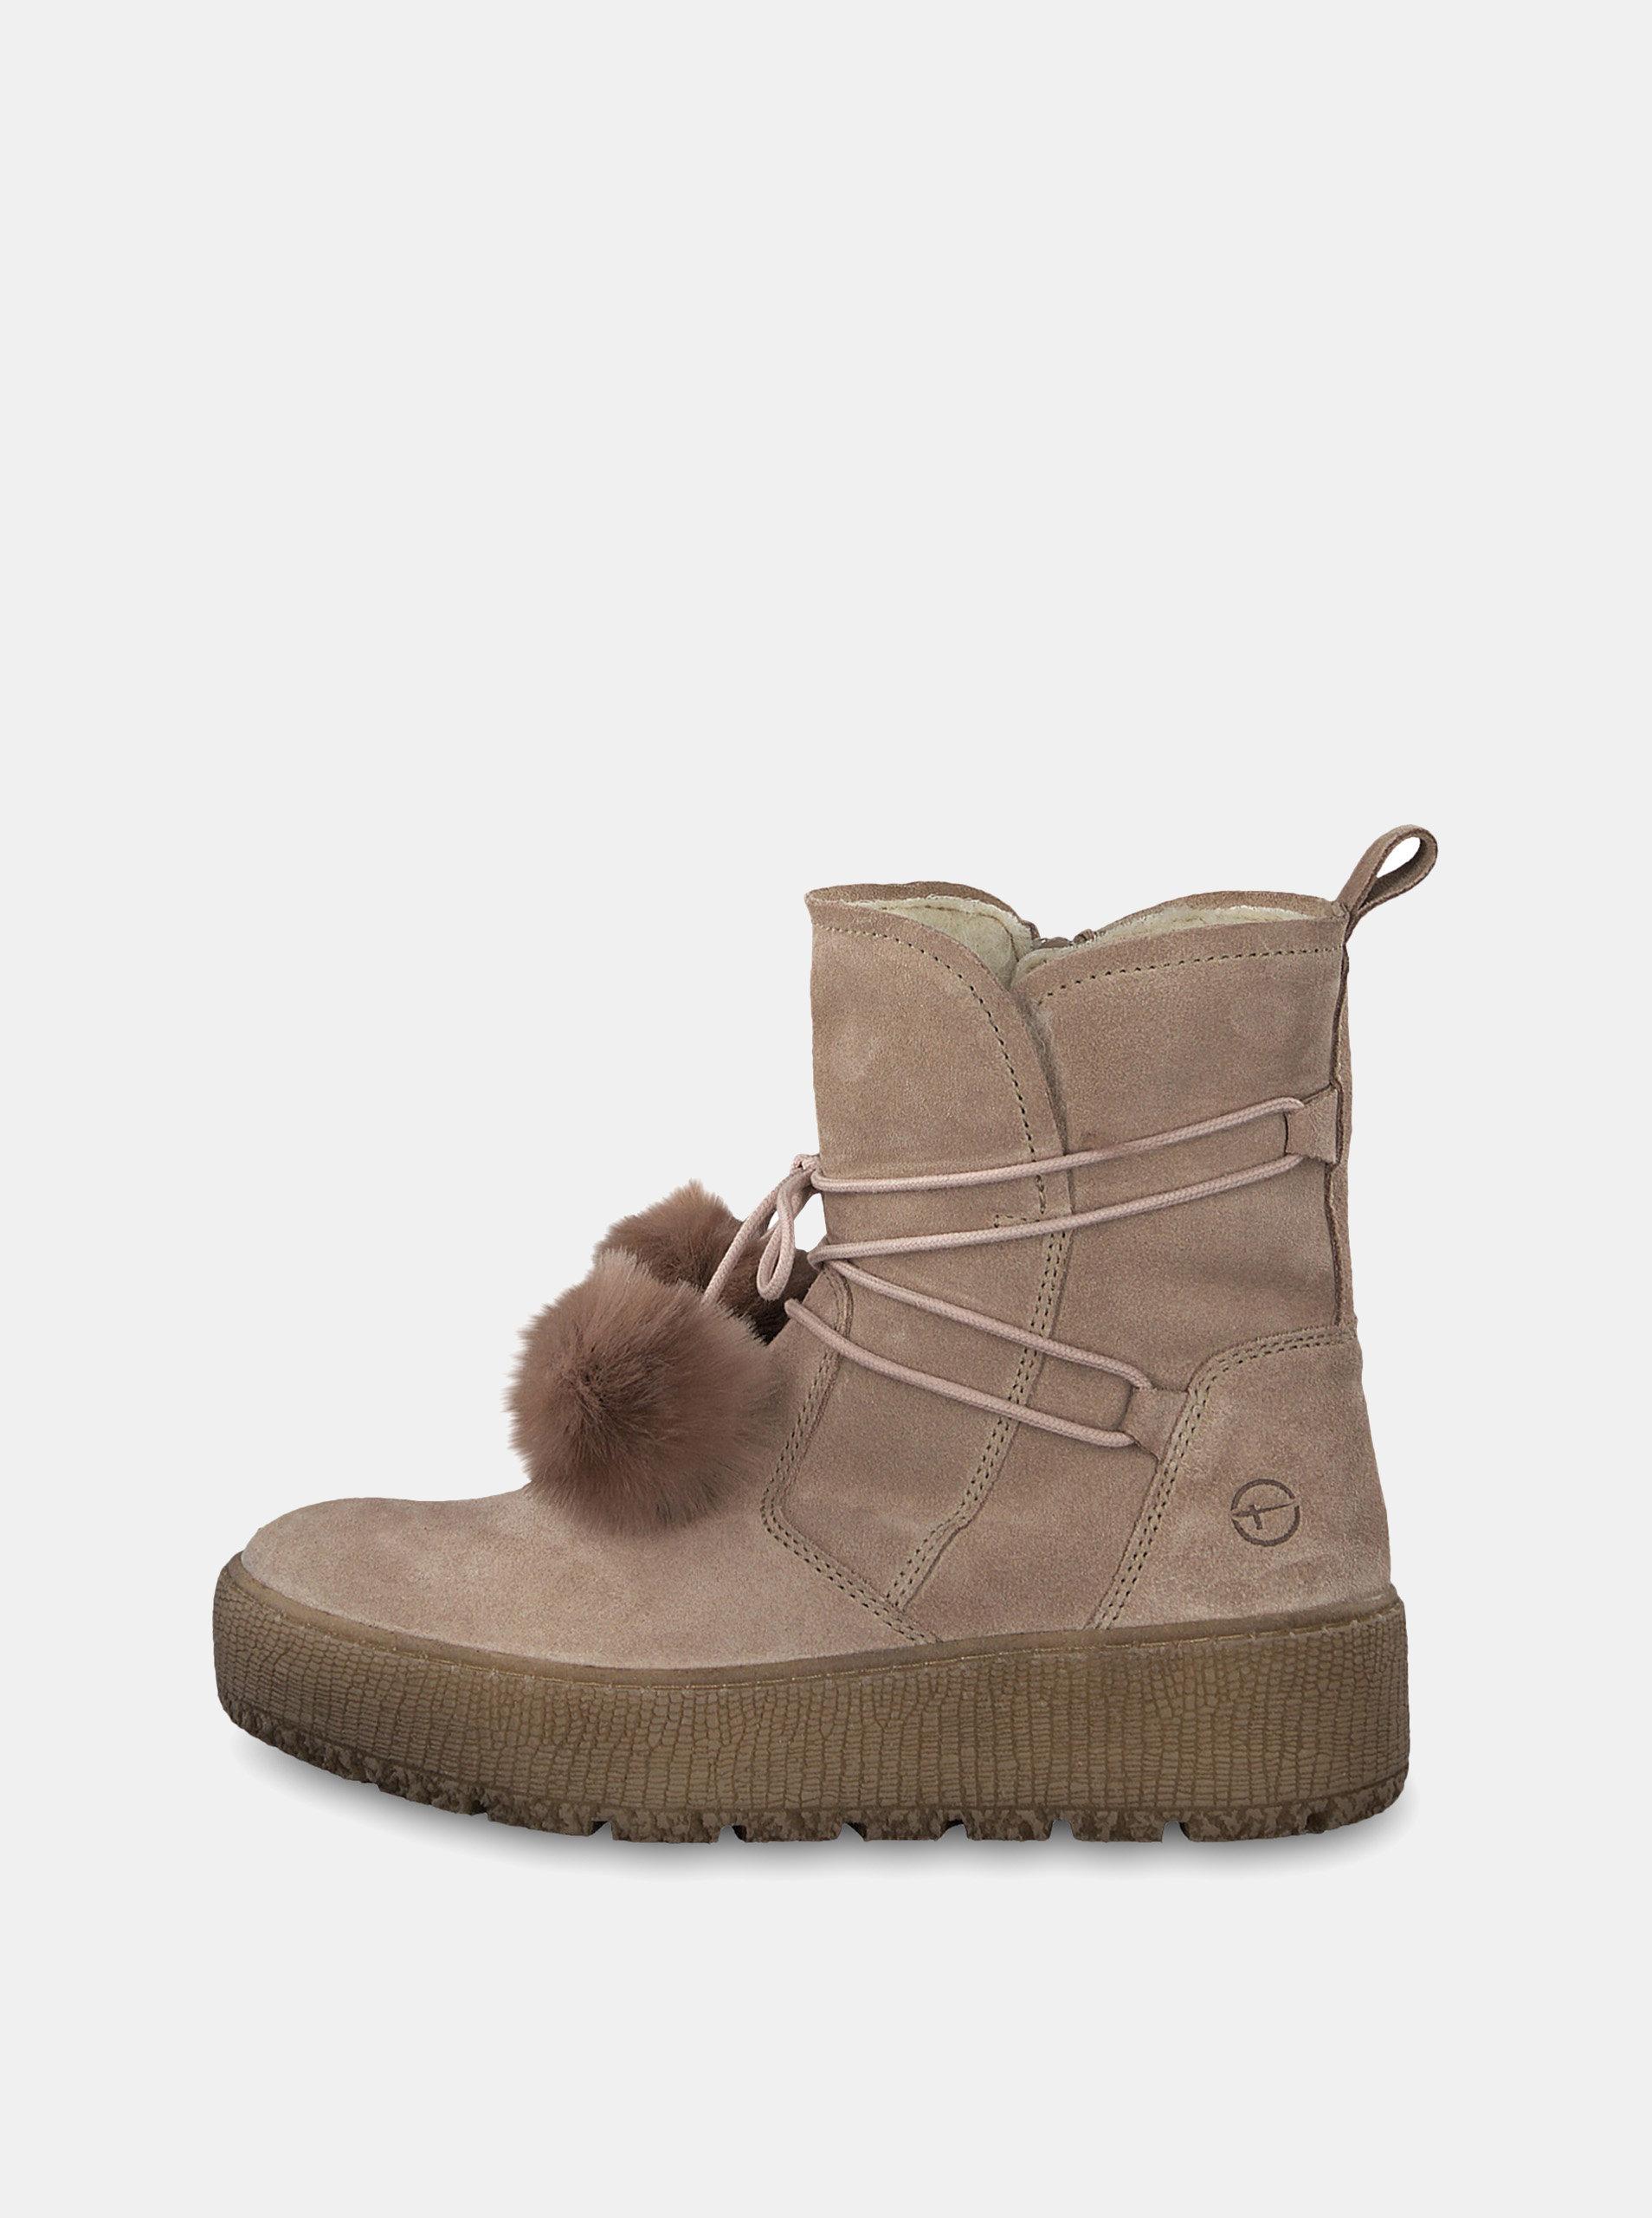 978b2975a63a Béžové semišové členkové zimné topánky na platforme Tamaris ...